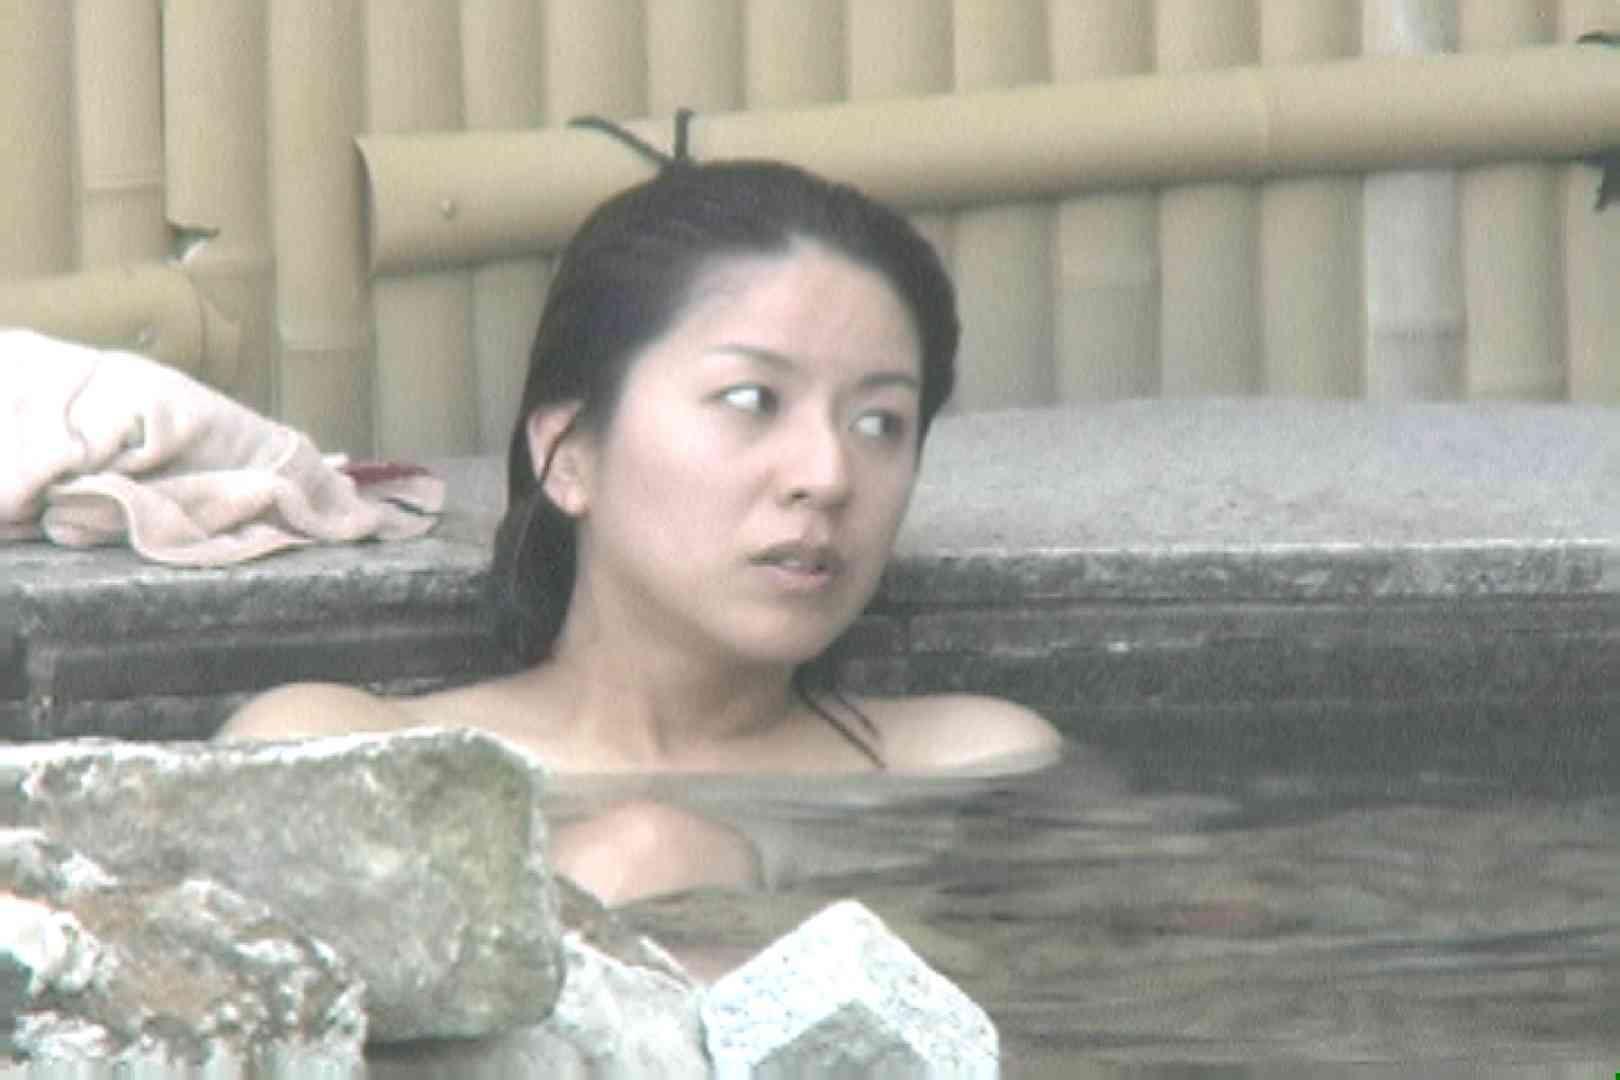 Aquaな露天風呂Vol.694 露天 | OLセックス  67画像 64